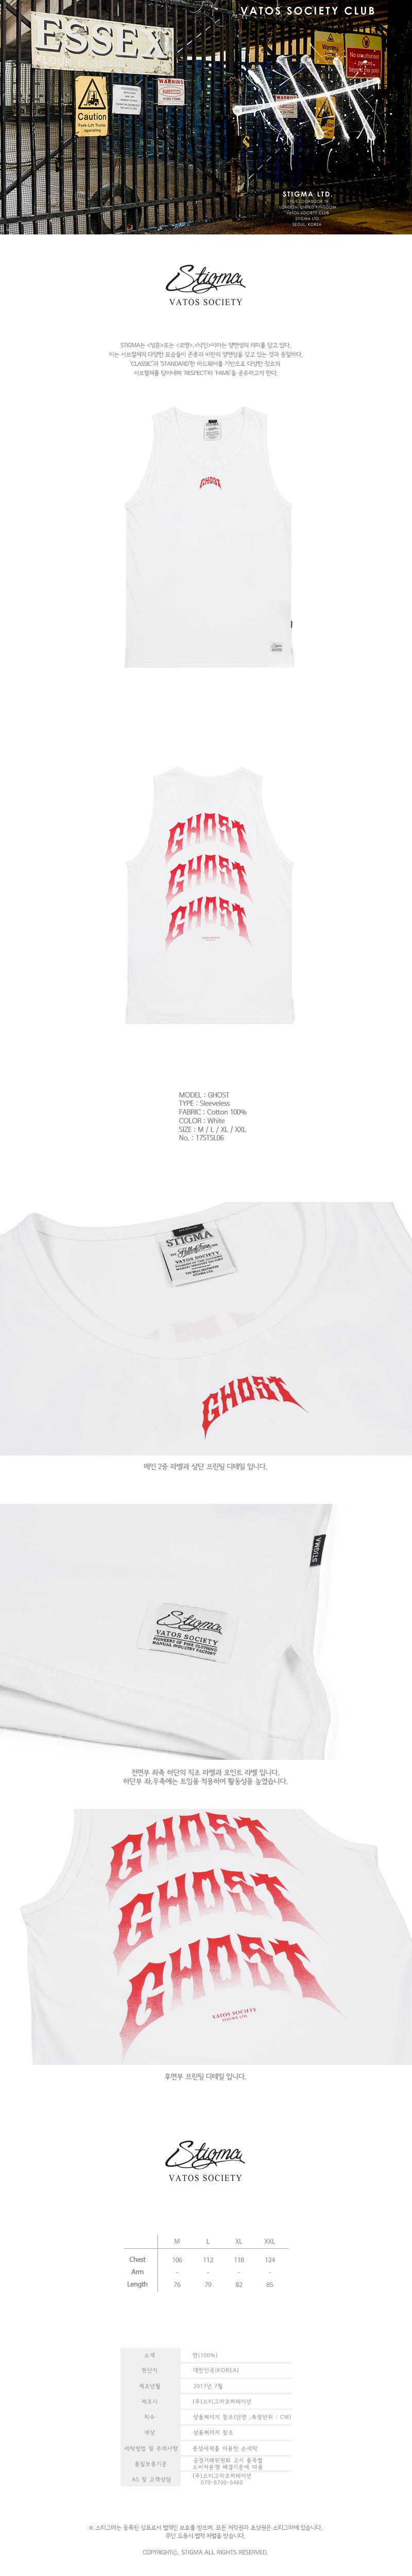 GHOST SLEEVELESS WHITE32,000원-스티그마패션의류, 남성상의, 티셔츠, 나시/민소매티셔츠바보사랑GHOST SLEEVELESS WHITE32,000원-스티그마패션의류, 남성상의, 티셔츠, 나시/민소매티셔츠바보사랑